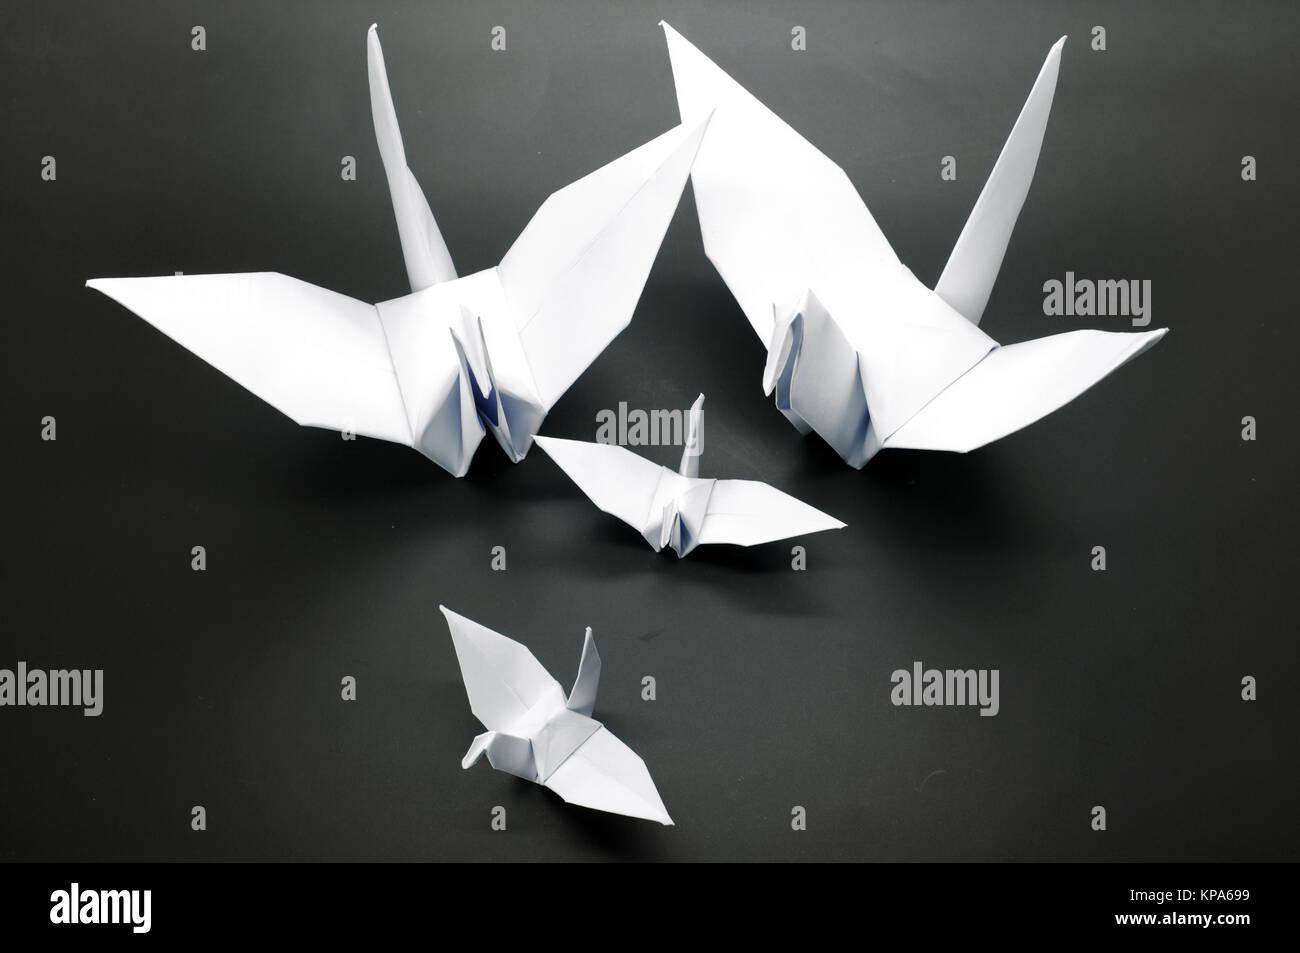 origami crane flying stock photos amp origami crane flying